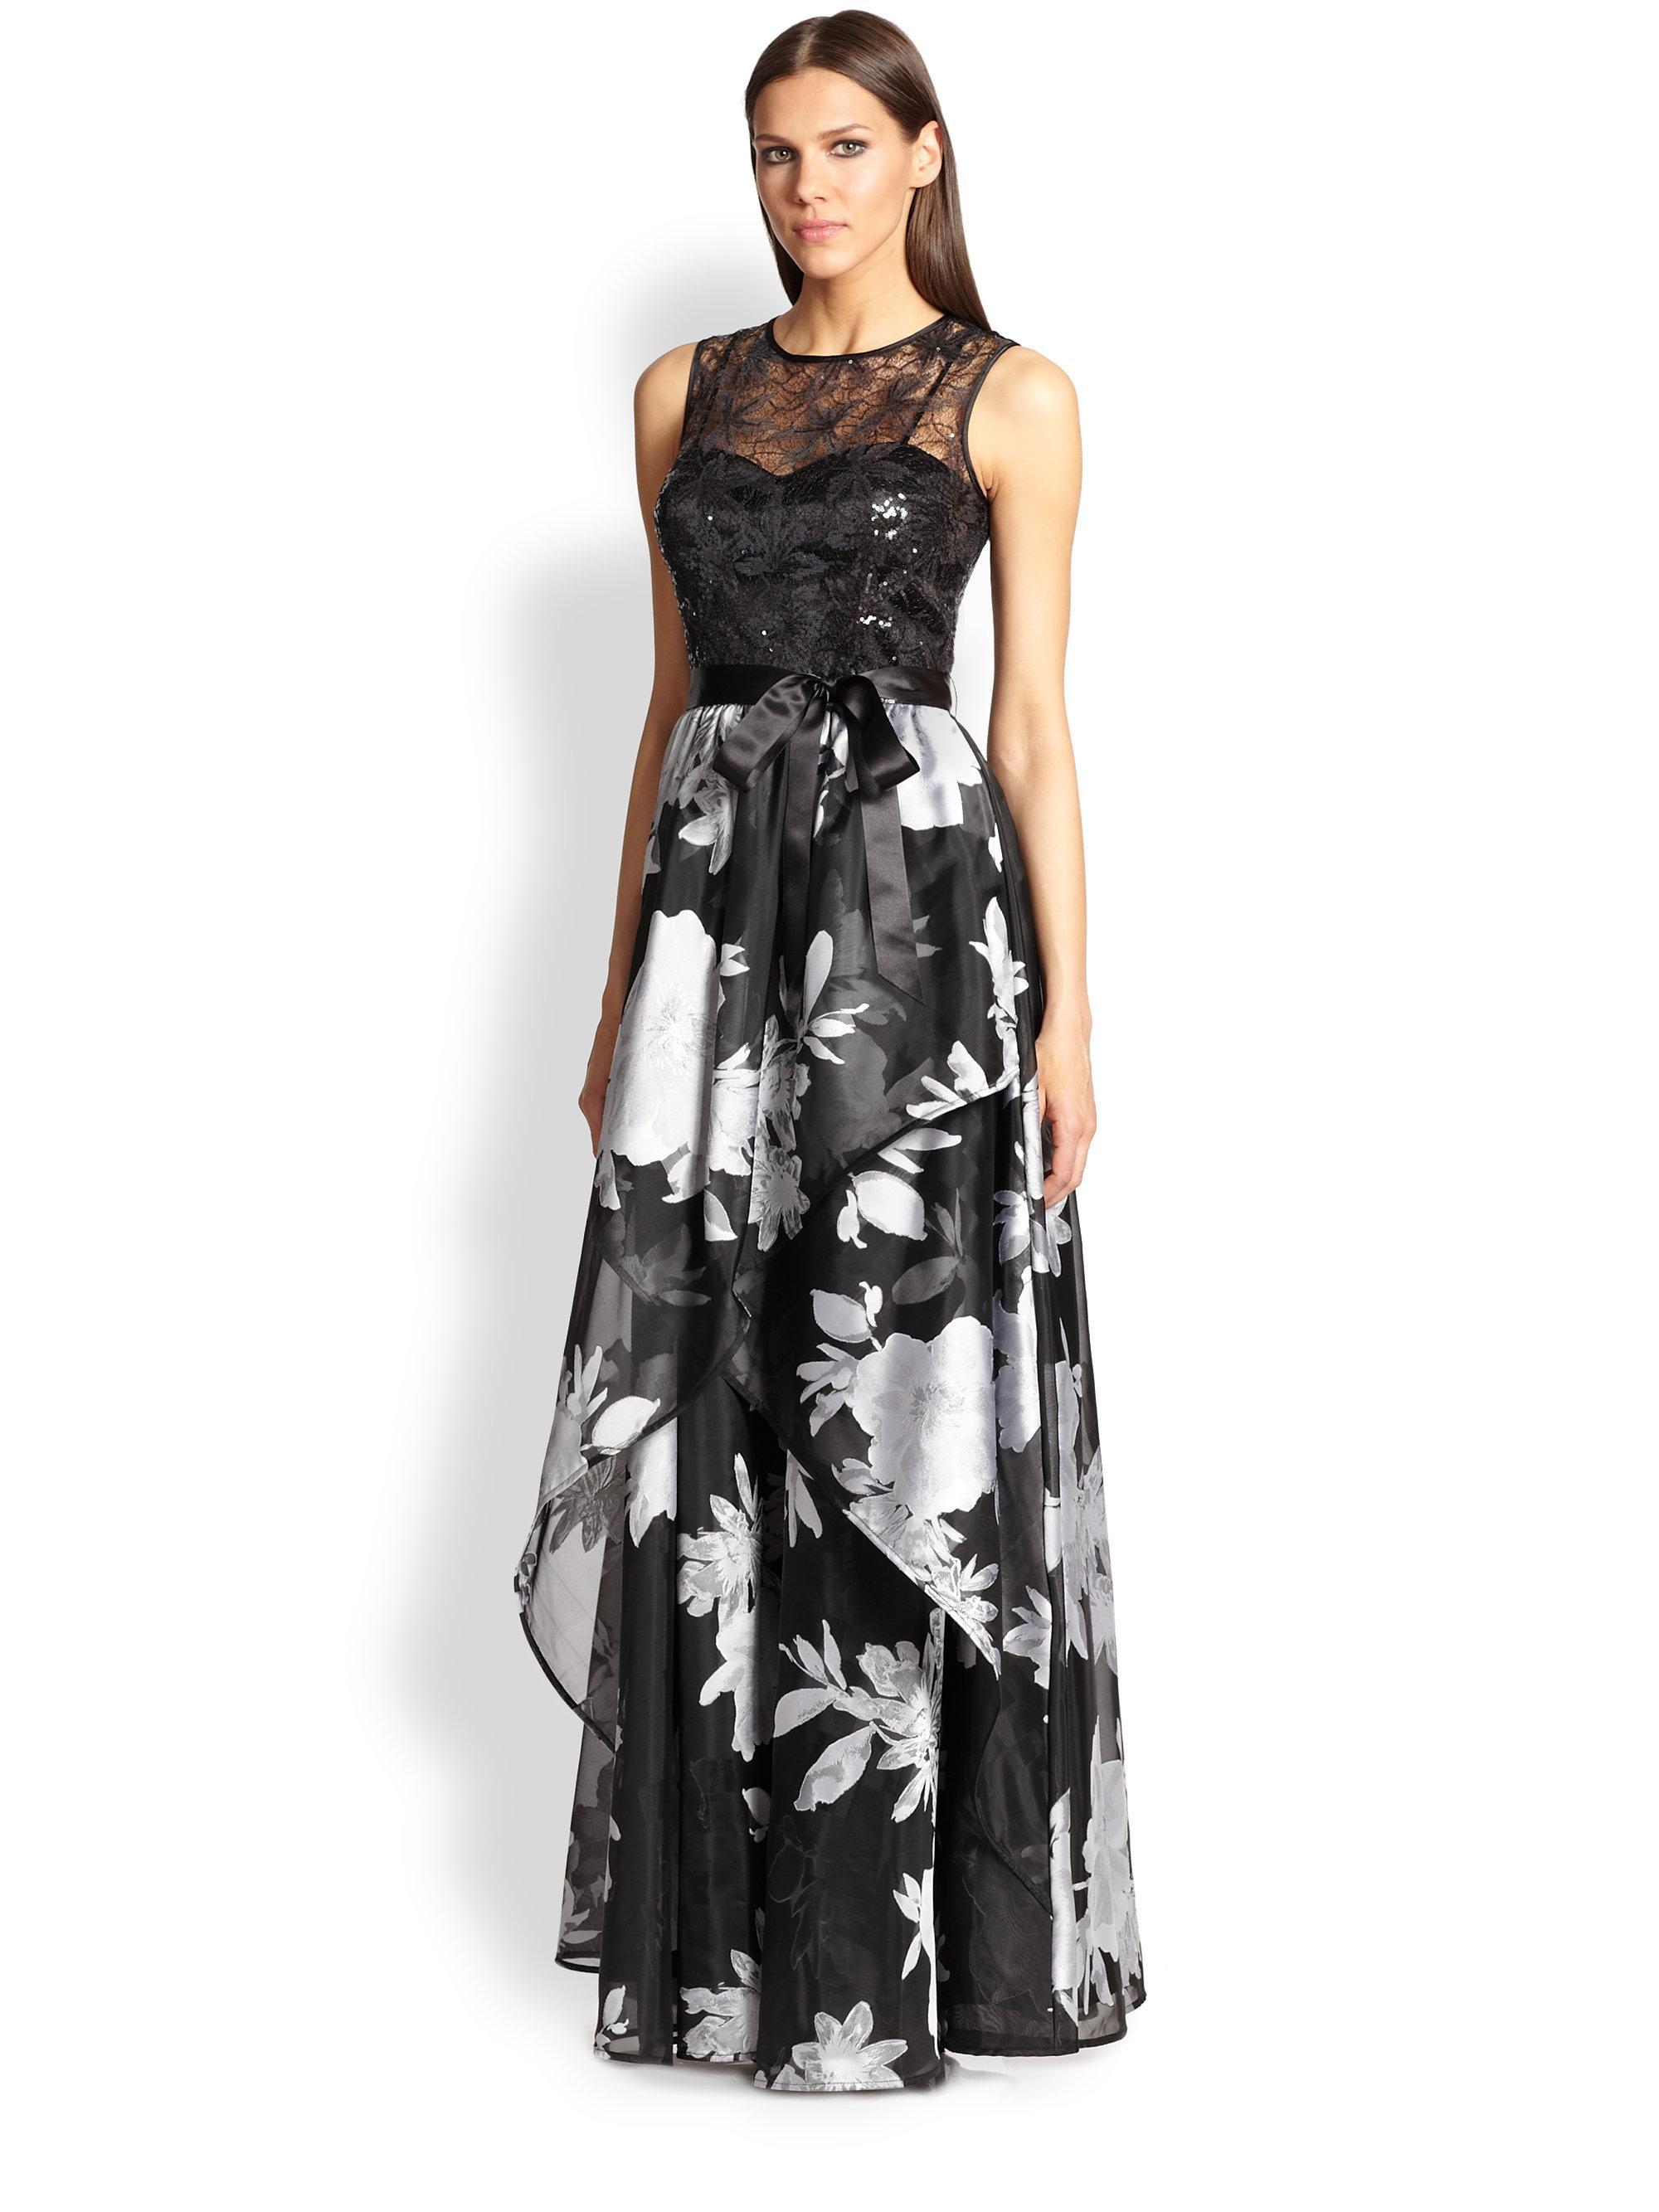 Teri Jon Dresses Bloomingdale\'s_Other dresses_dressesss